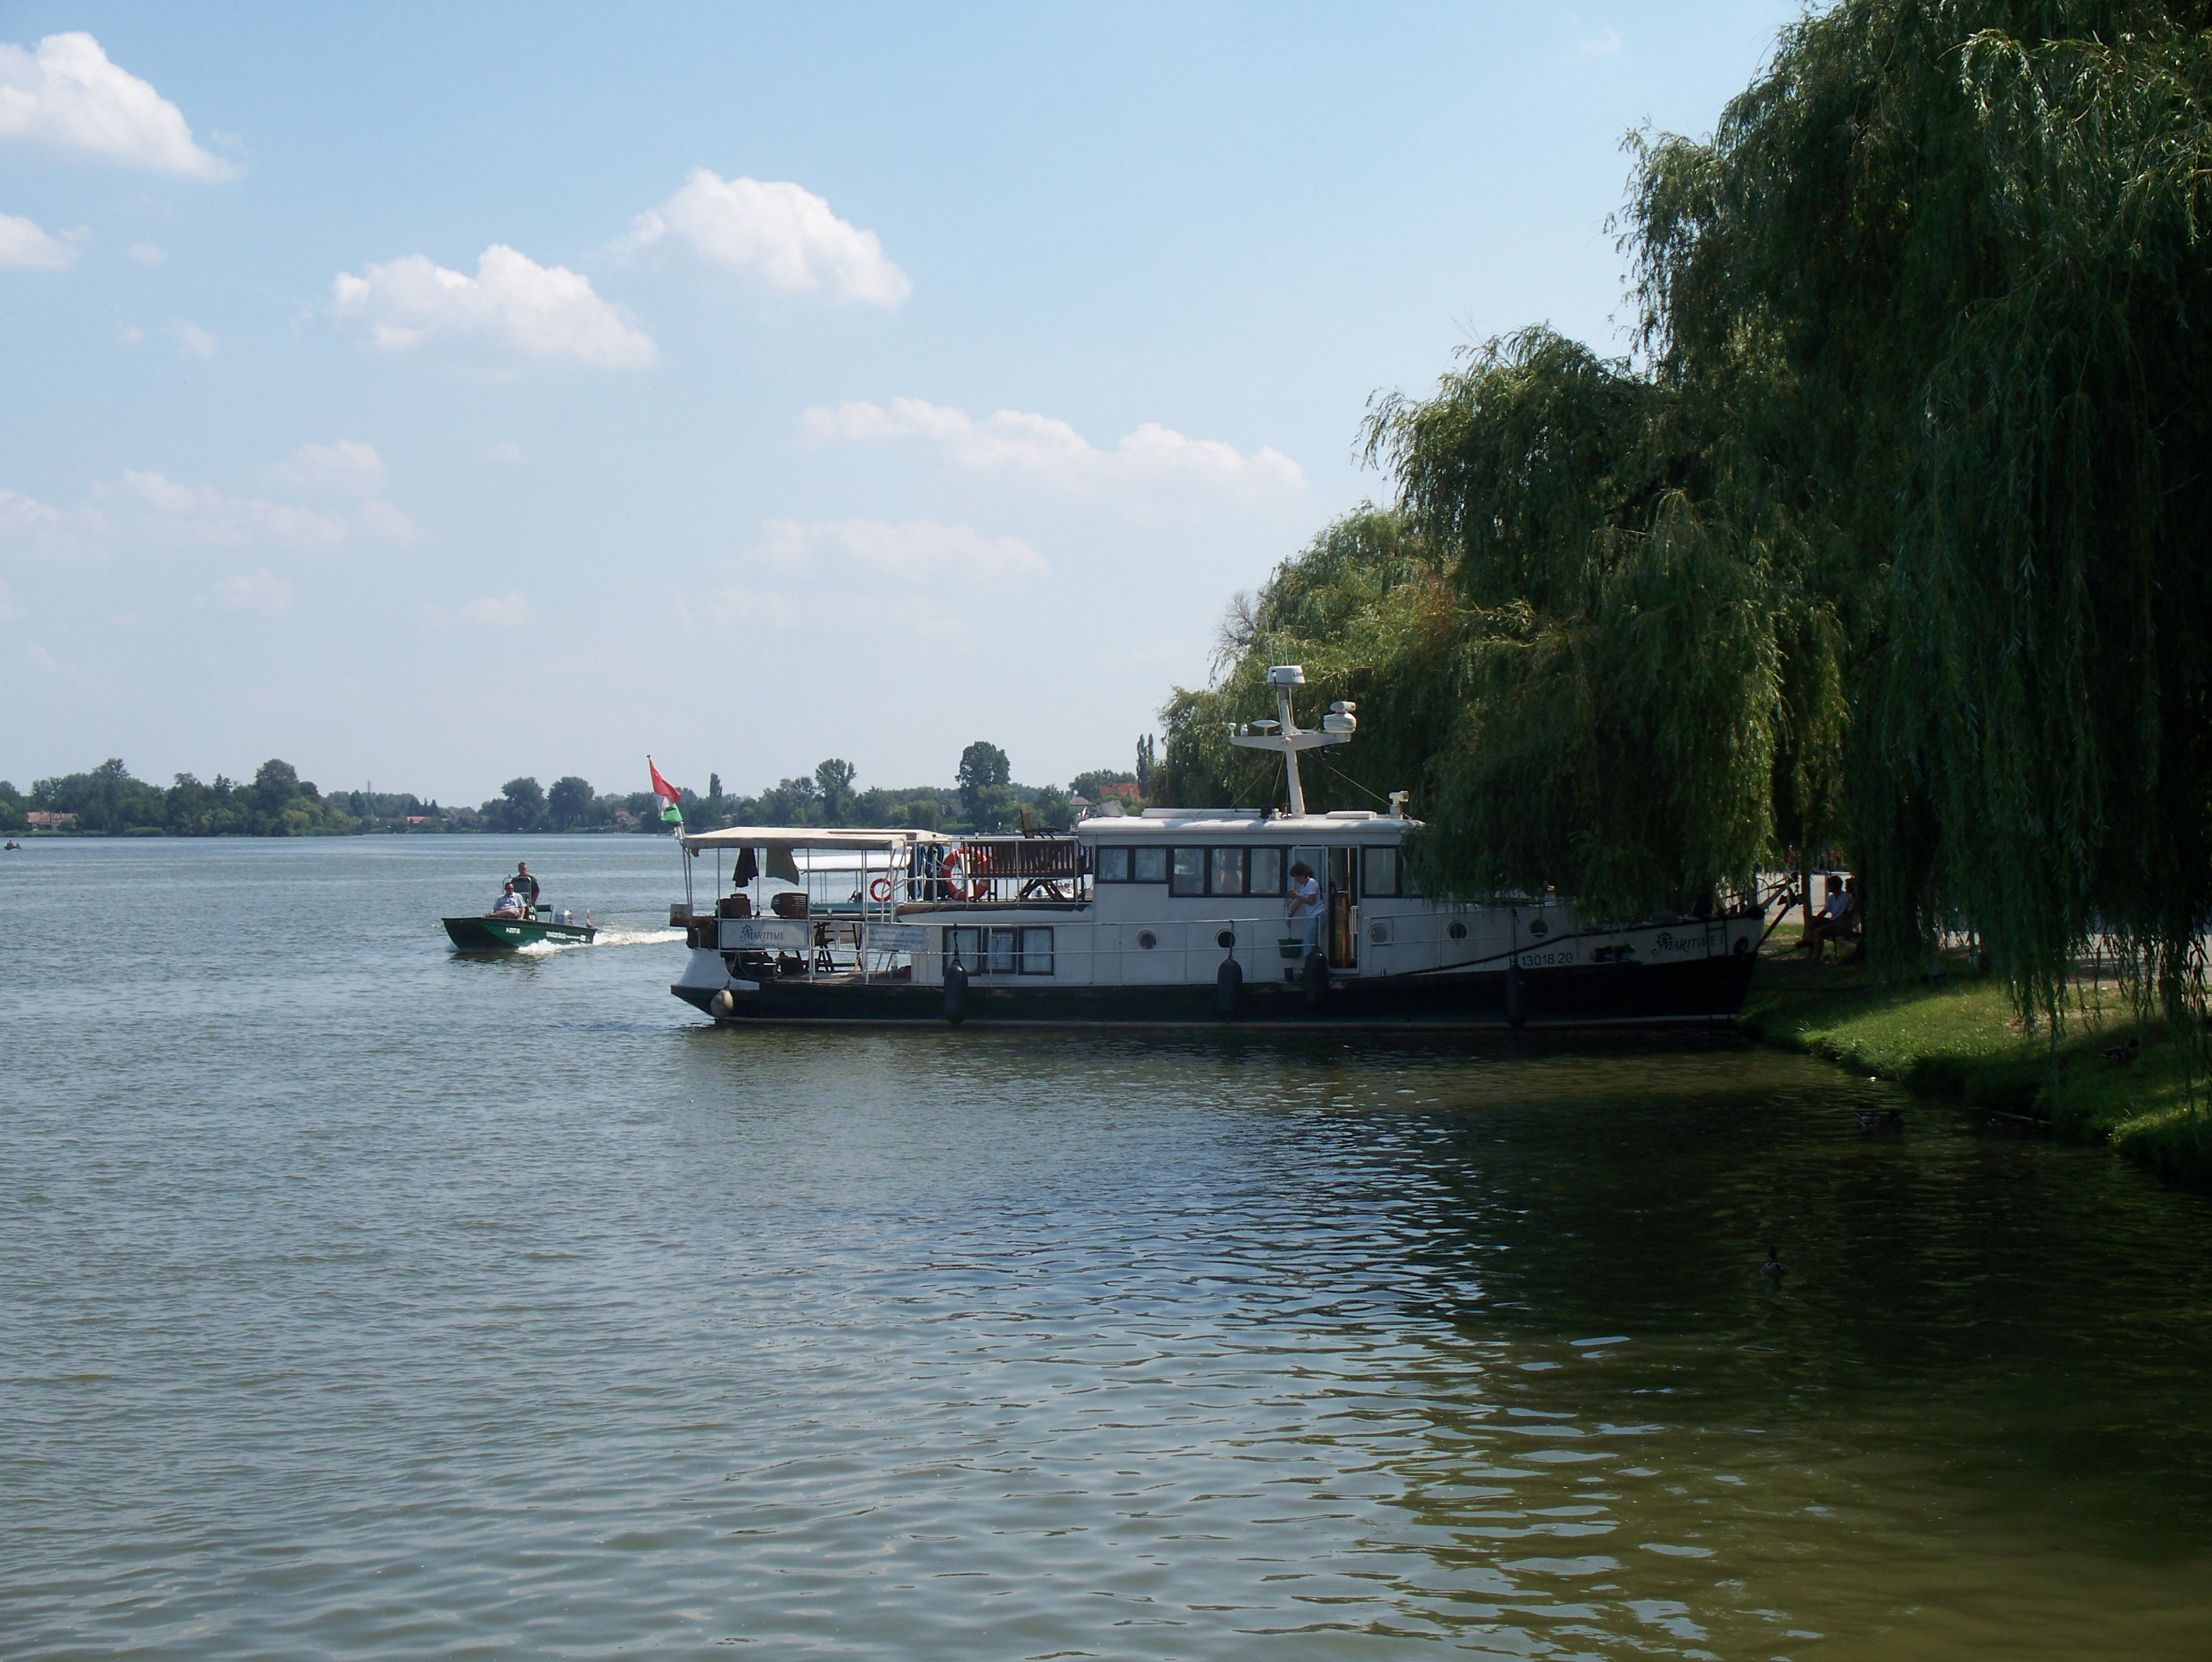 http://www.kisdunainagyhajok.hu/egyebhajok/2012_06_24_maritime_motoros_vonatohajo_a_rackevei_piacnal/2012_06_24_maritime_motoros_vonatohajo_a_rackevei_piacnal_013.jpg